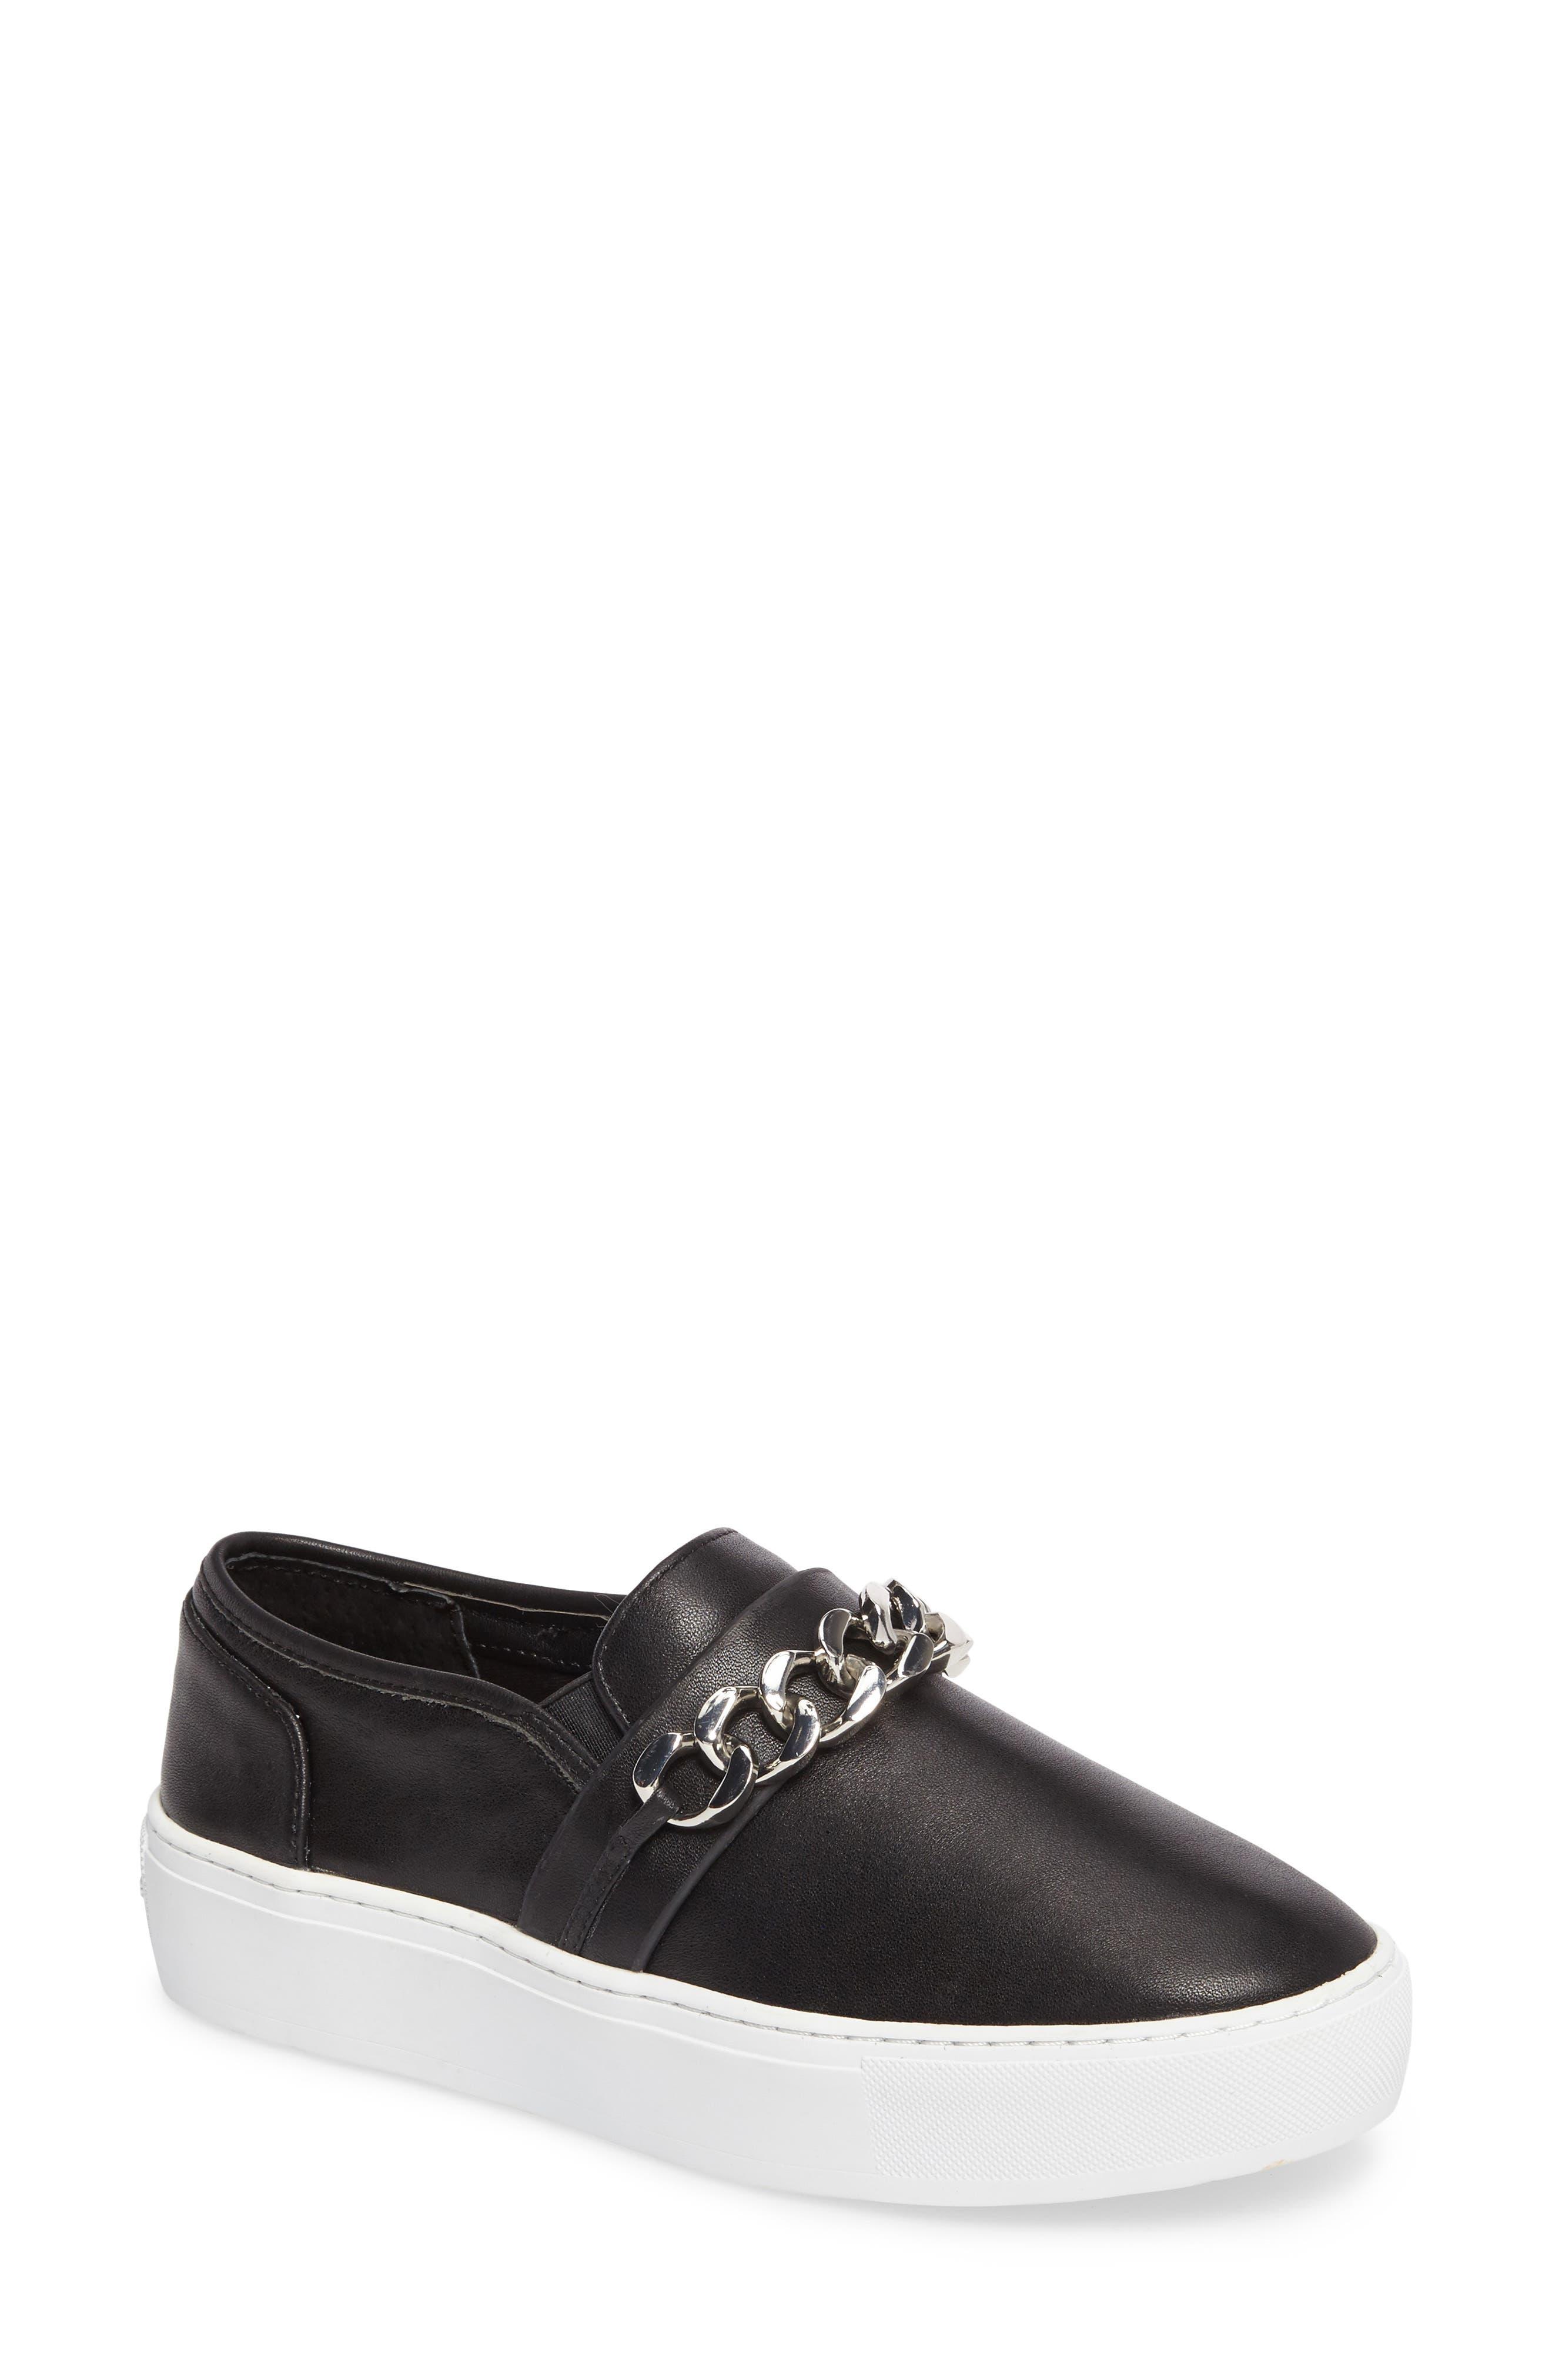 Nala Slip-On Sneaker,                         Main,                         color, 001